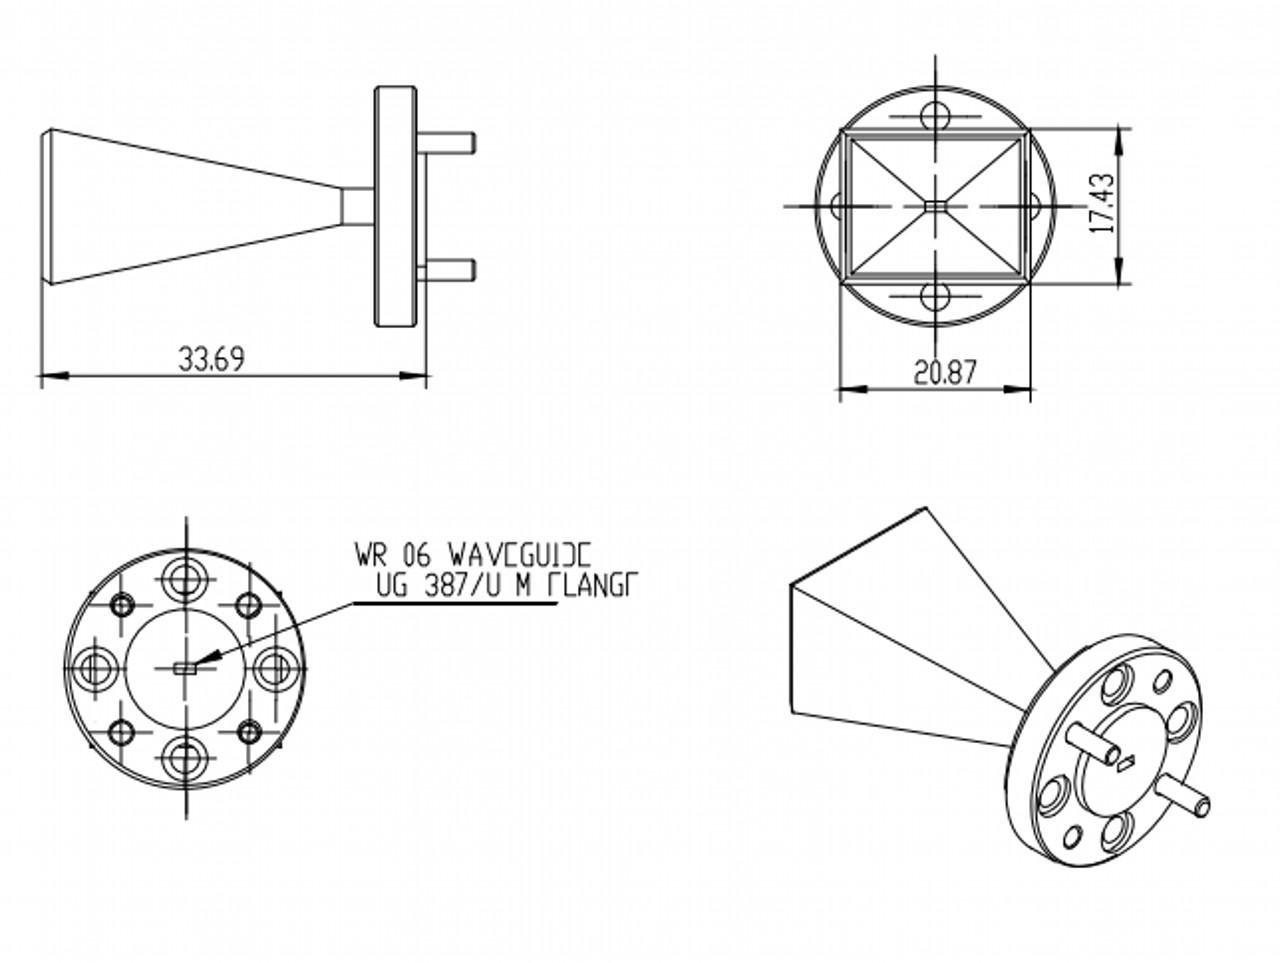 23 dBi Gain, 110 GHz to 170 GHz, WR-06 Waveguide Millimeter SGH Antenna